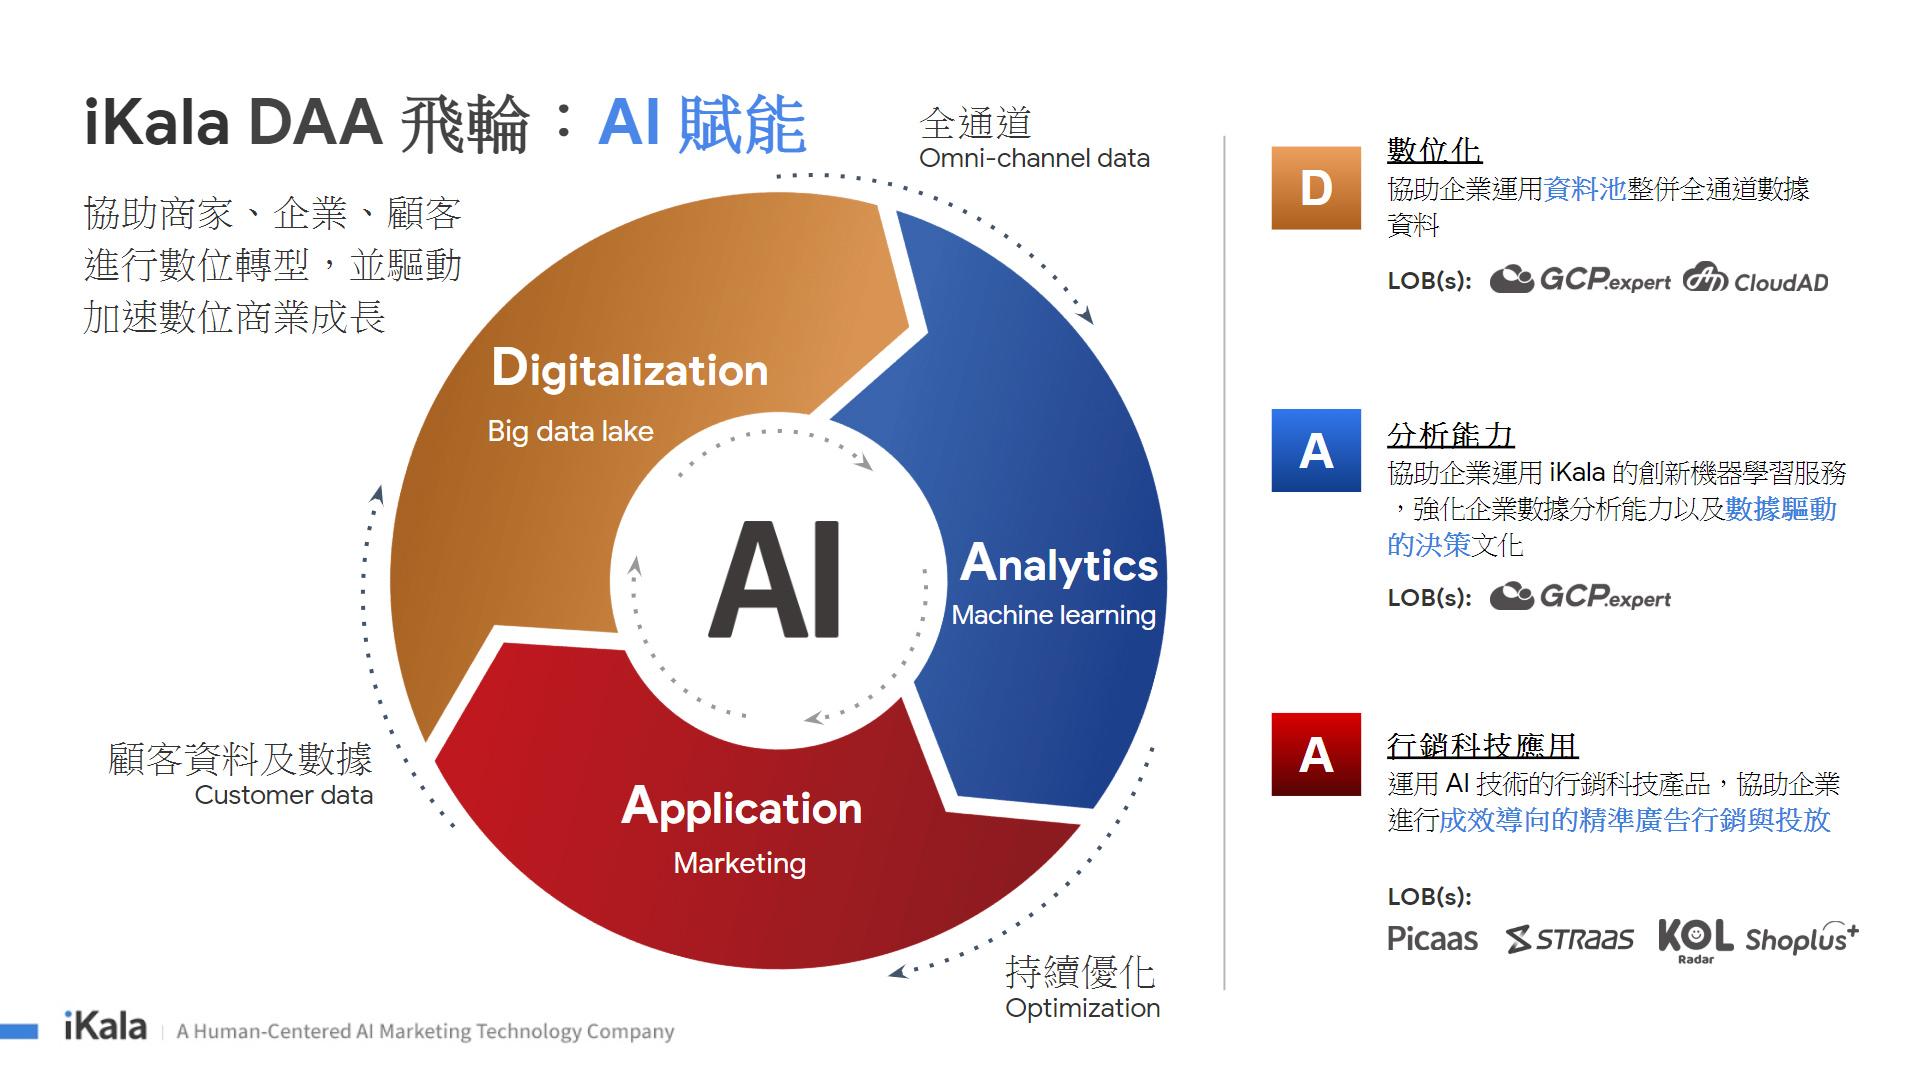 iKala DAA 飛輪協助企業透過 AI 進行數位轉型